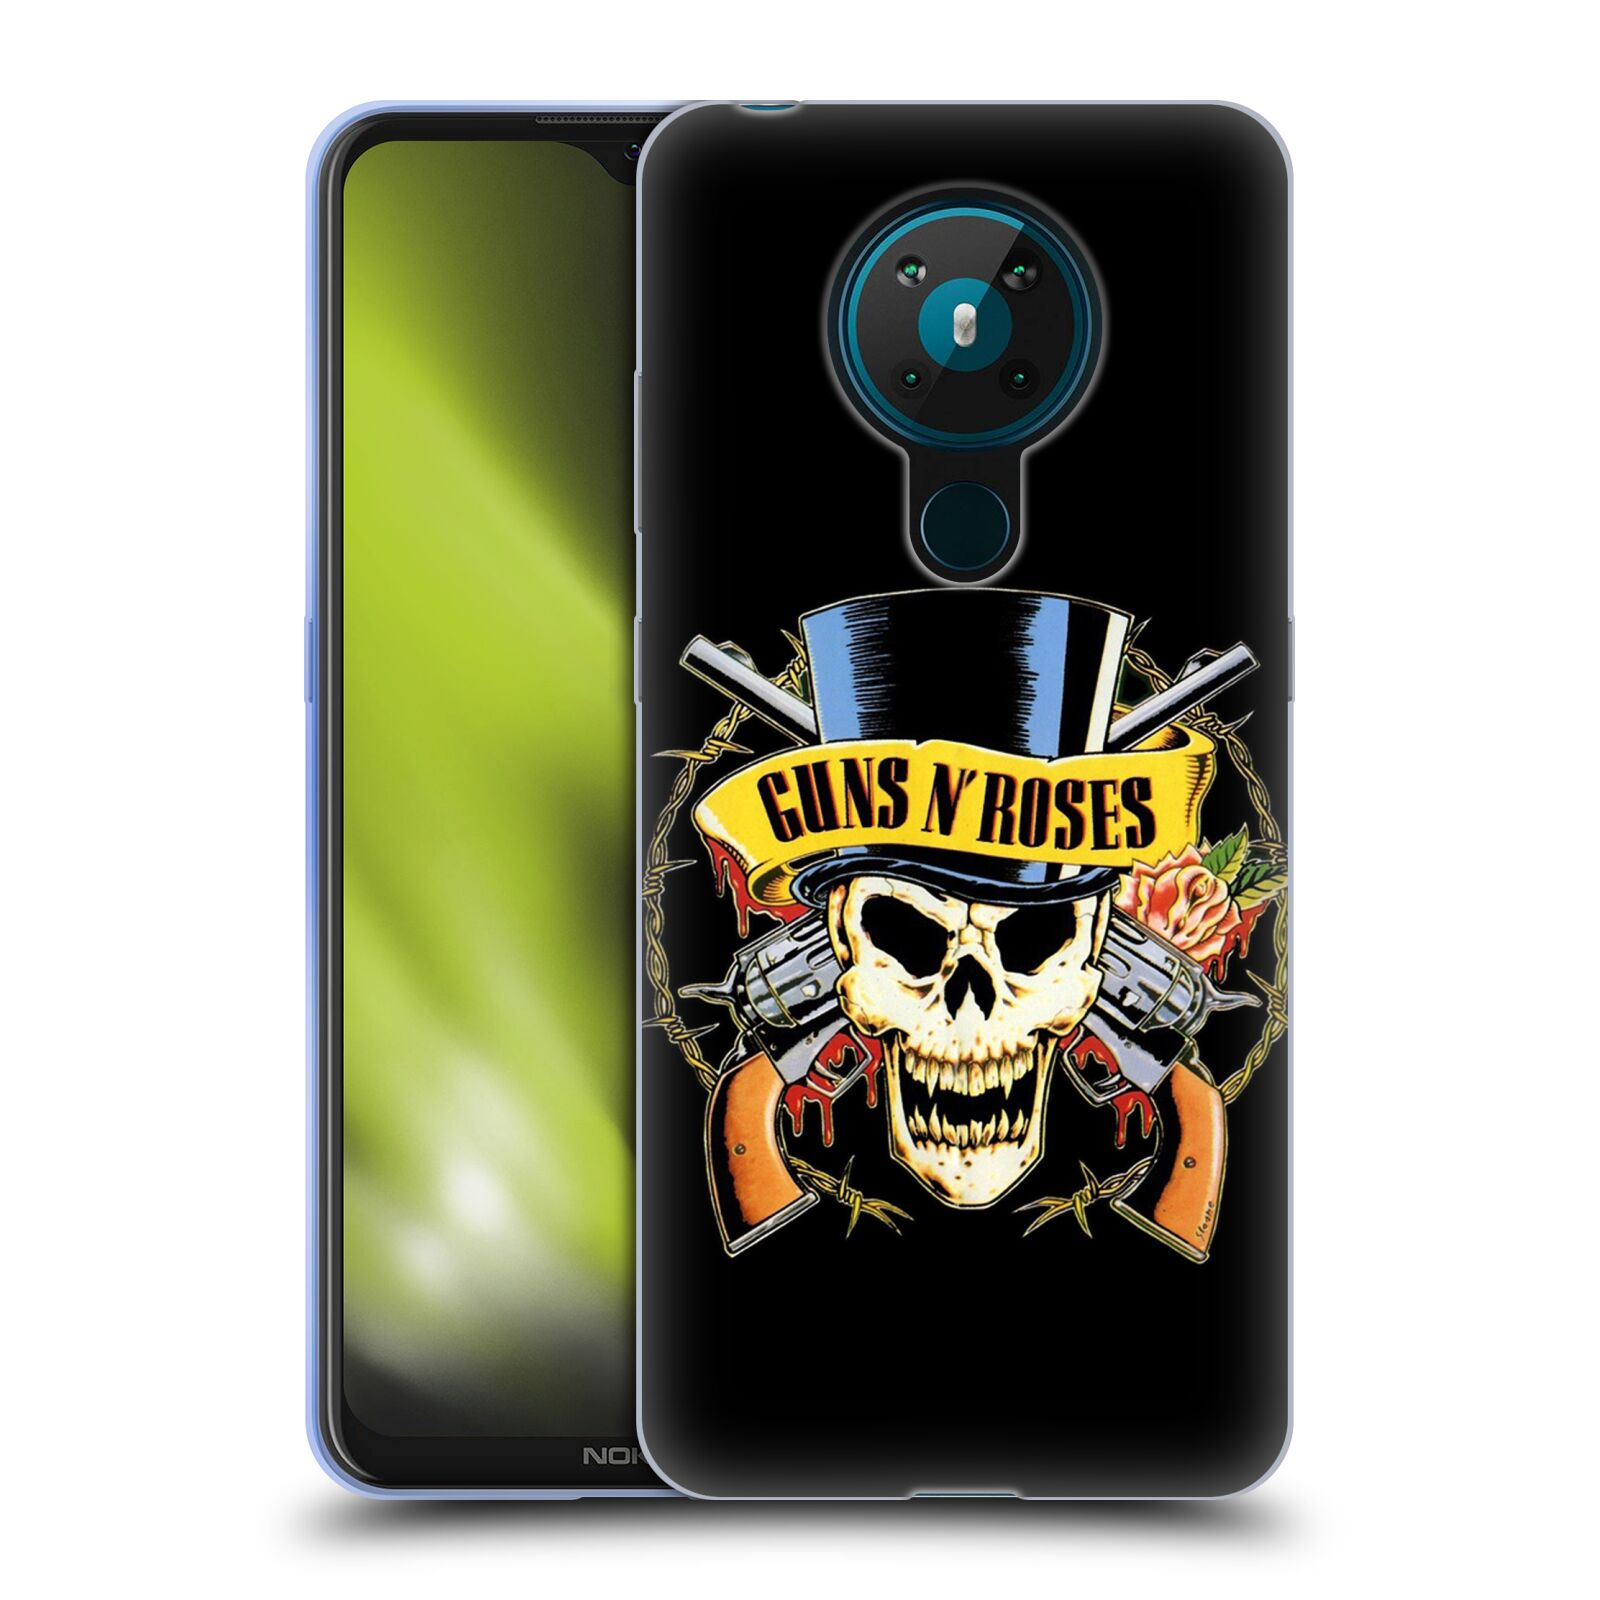 Silikonové pouzdro na mobil Nokia 5.3 - Head Case - Guns N' Roses - Lebka